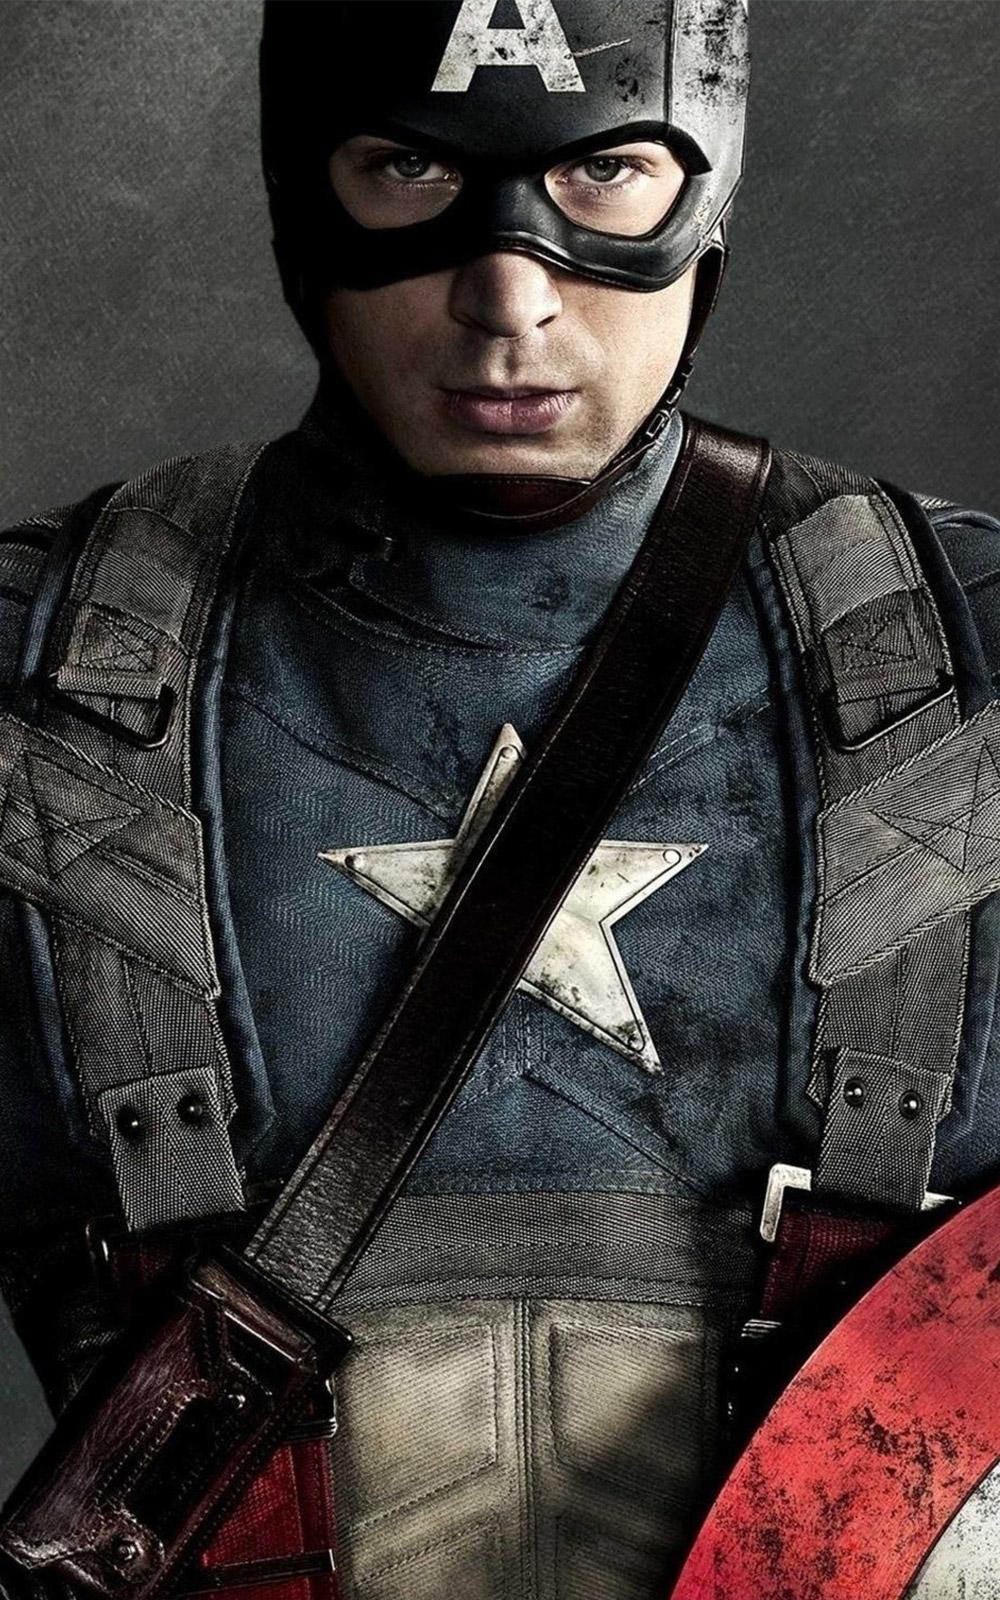 Download Captain America Free Pure 4k Ultra Hd Mobile Wallpaper